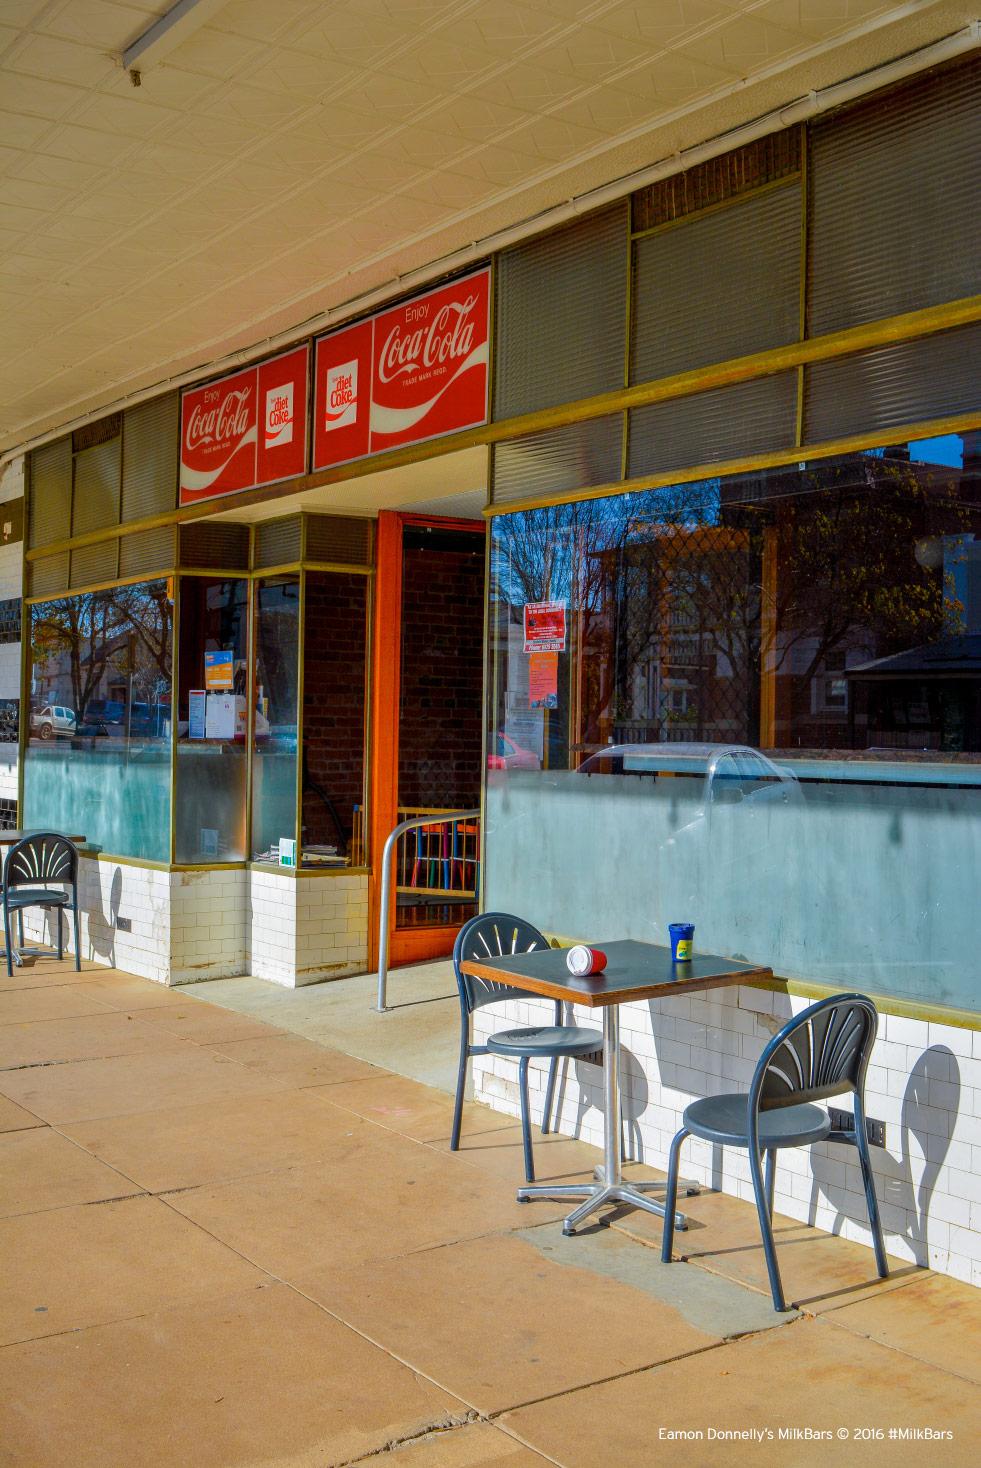 Henty-Cafe-Milk-Bar-Eamon-Donnelly's-Milk-Bars-Book-Project-(c)-2001-2016.jpg